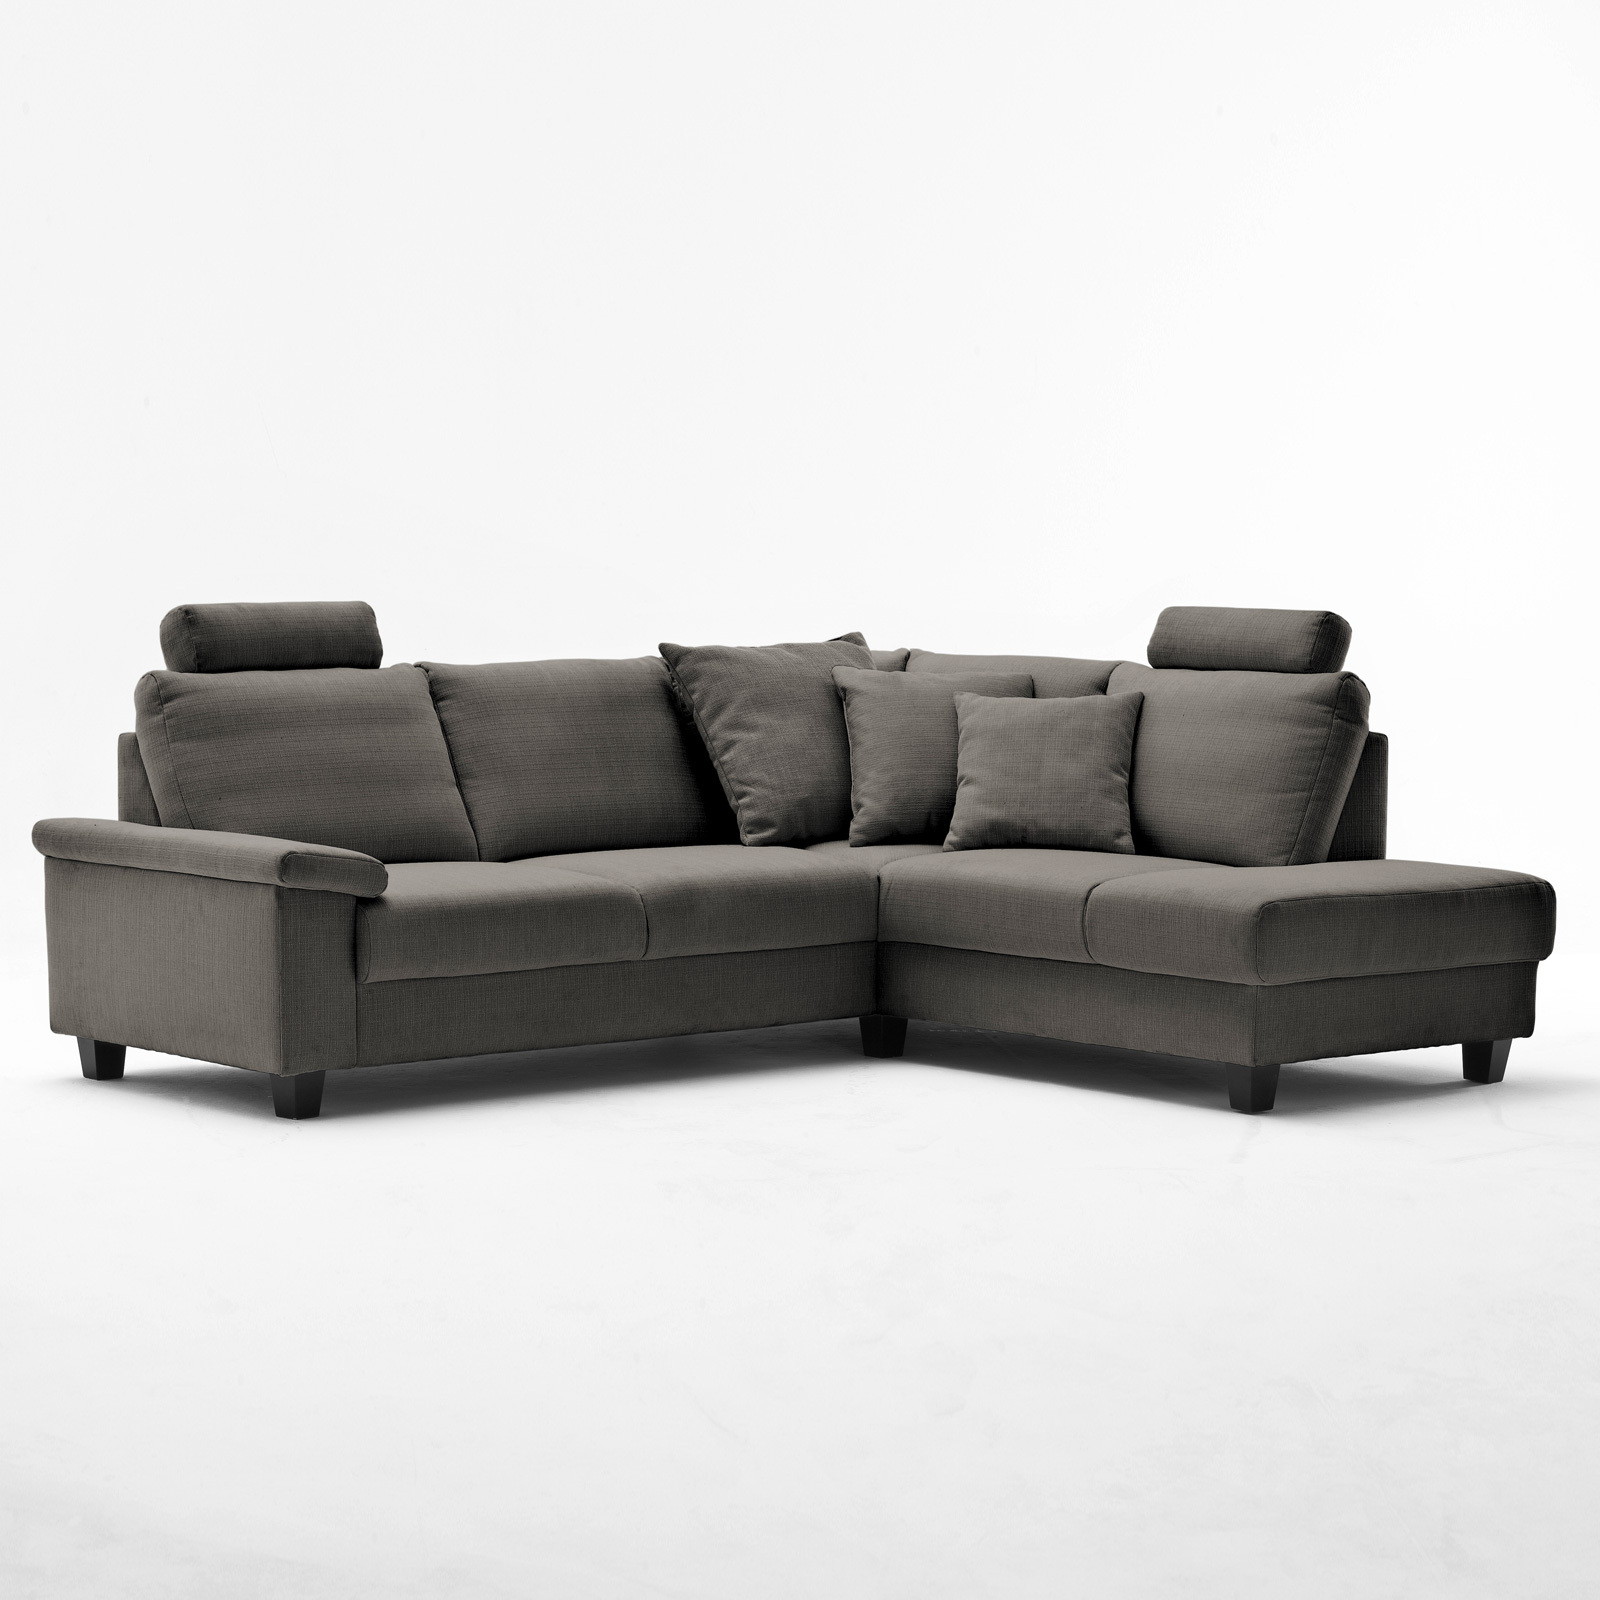 ecksofa neville wohnlandschaft sofa ottomane rechts. Black Bedroom Furniture Sets. Home Design Ideas